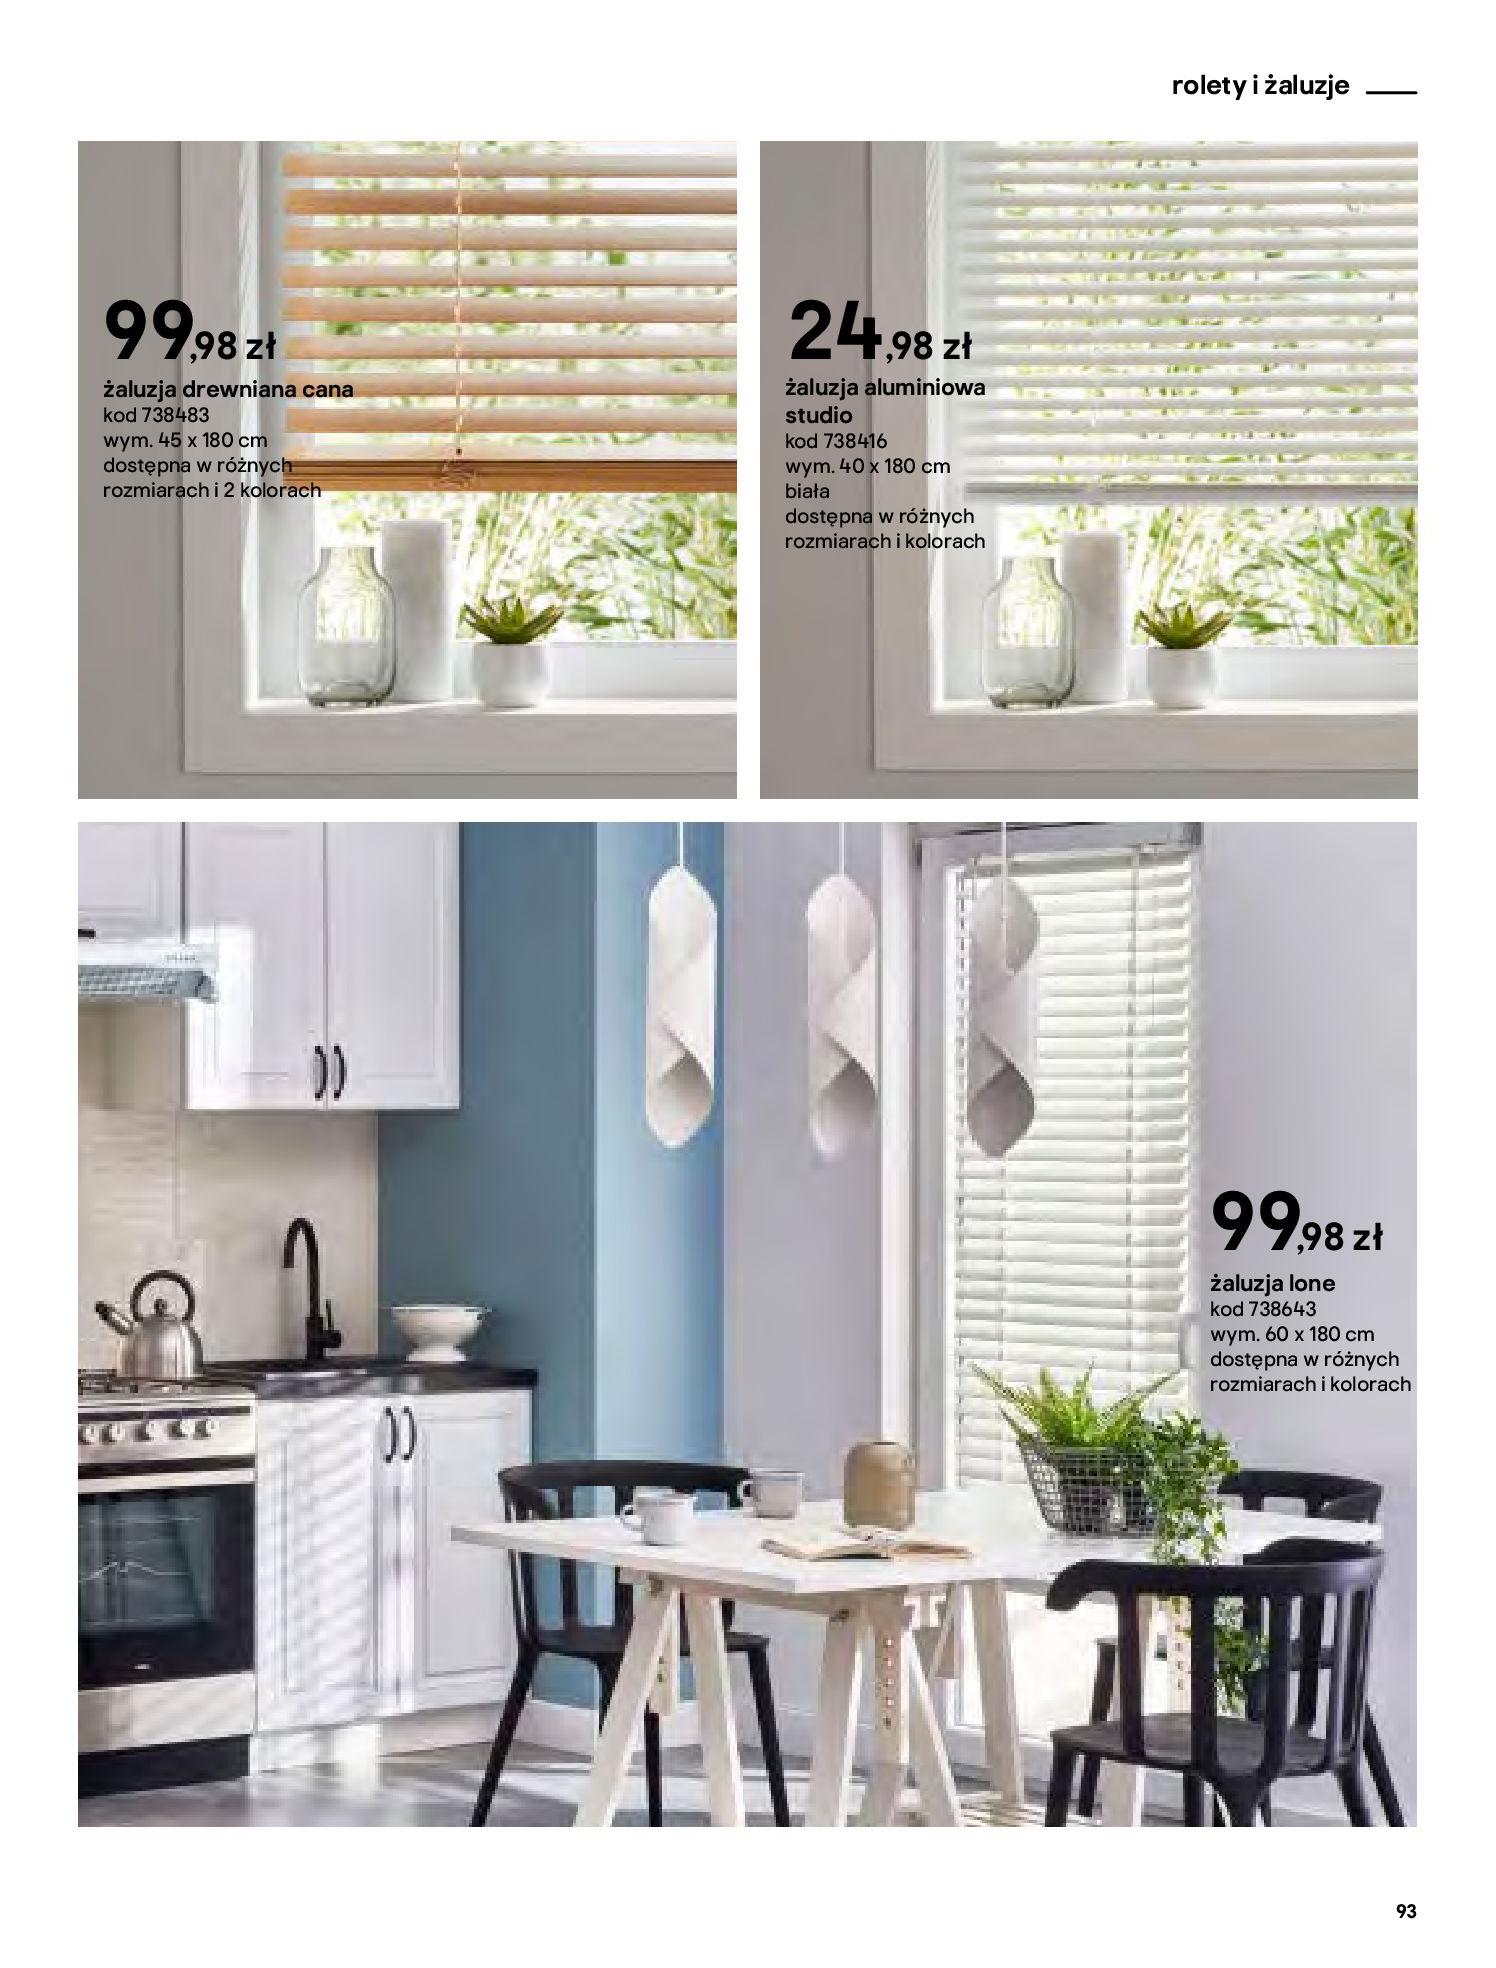 Gazetka Castorama - Katalog Dekoracje-22.10.2020-31.12.2020-page-93